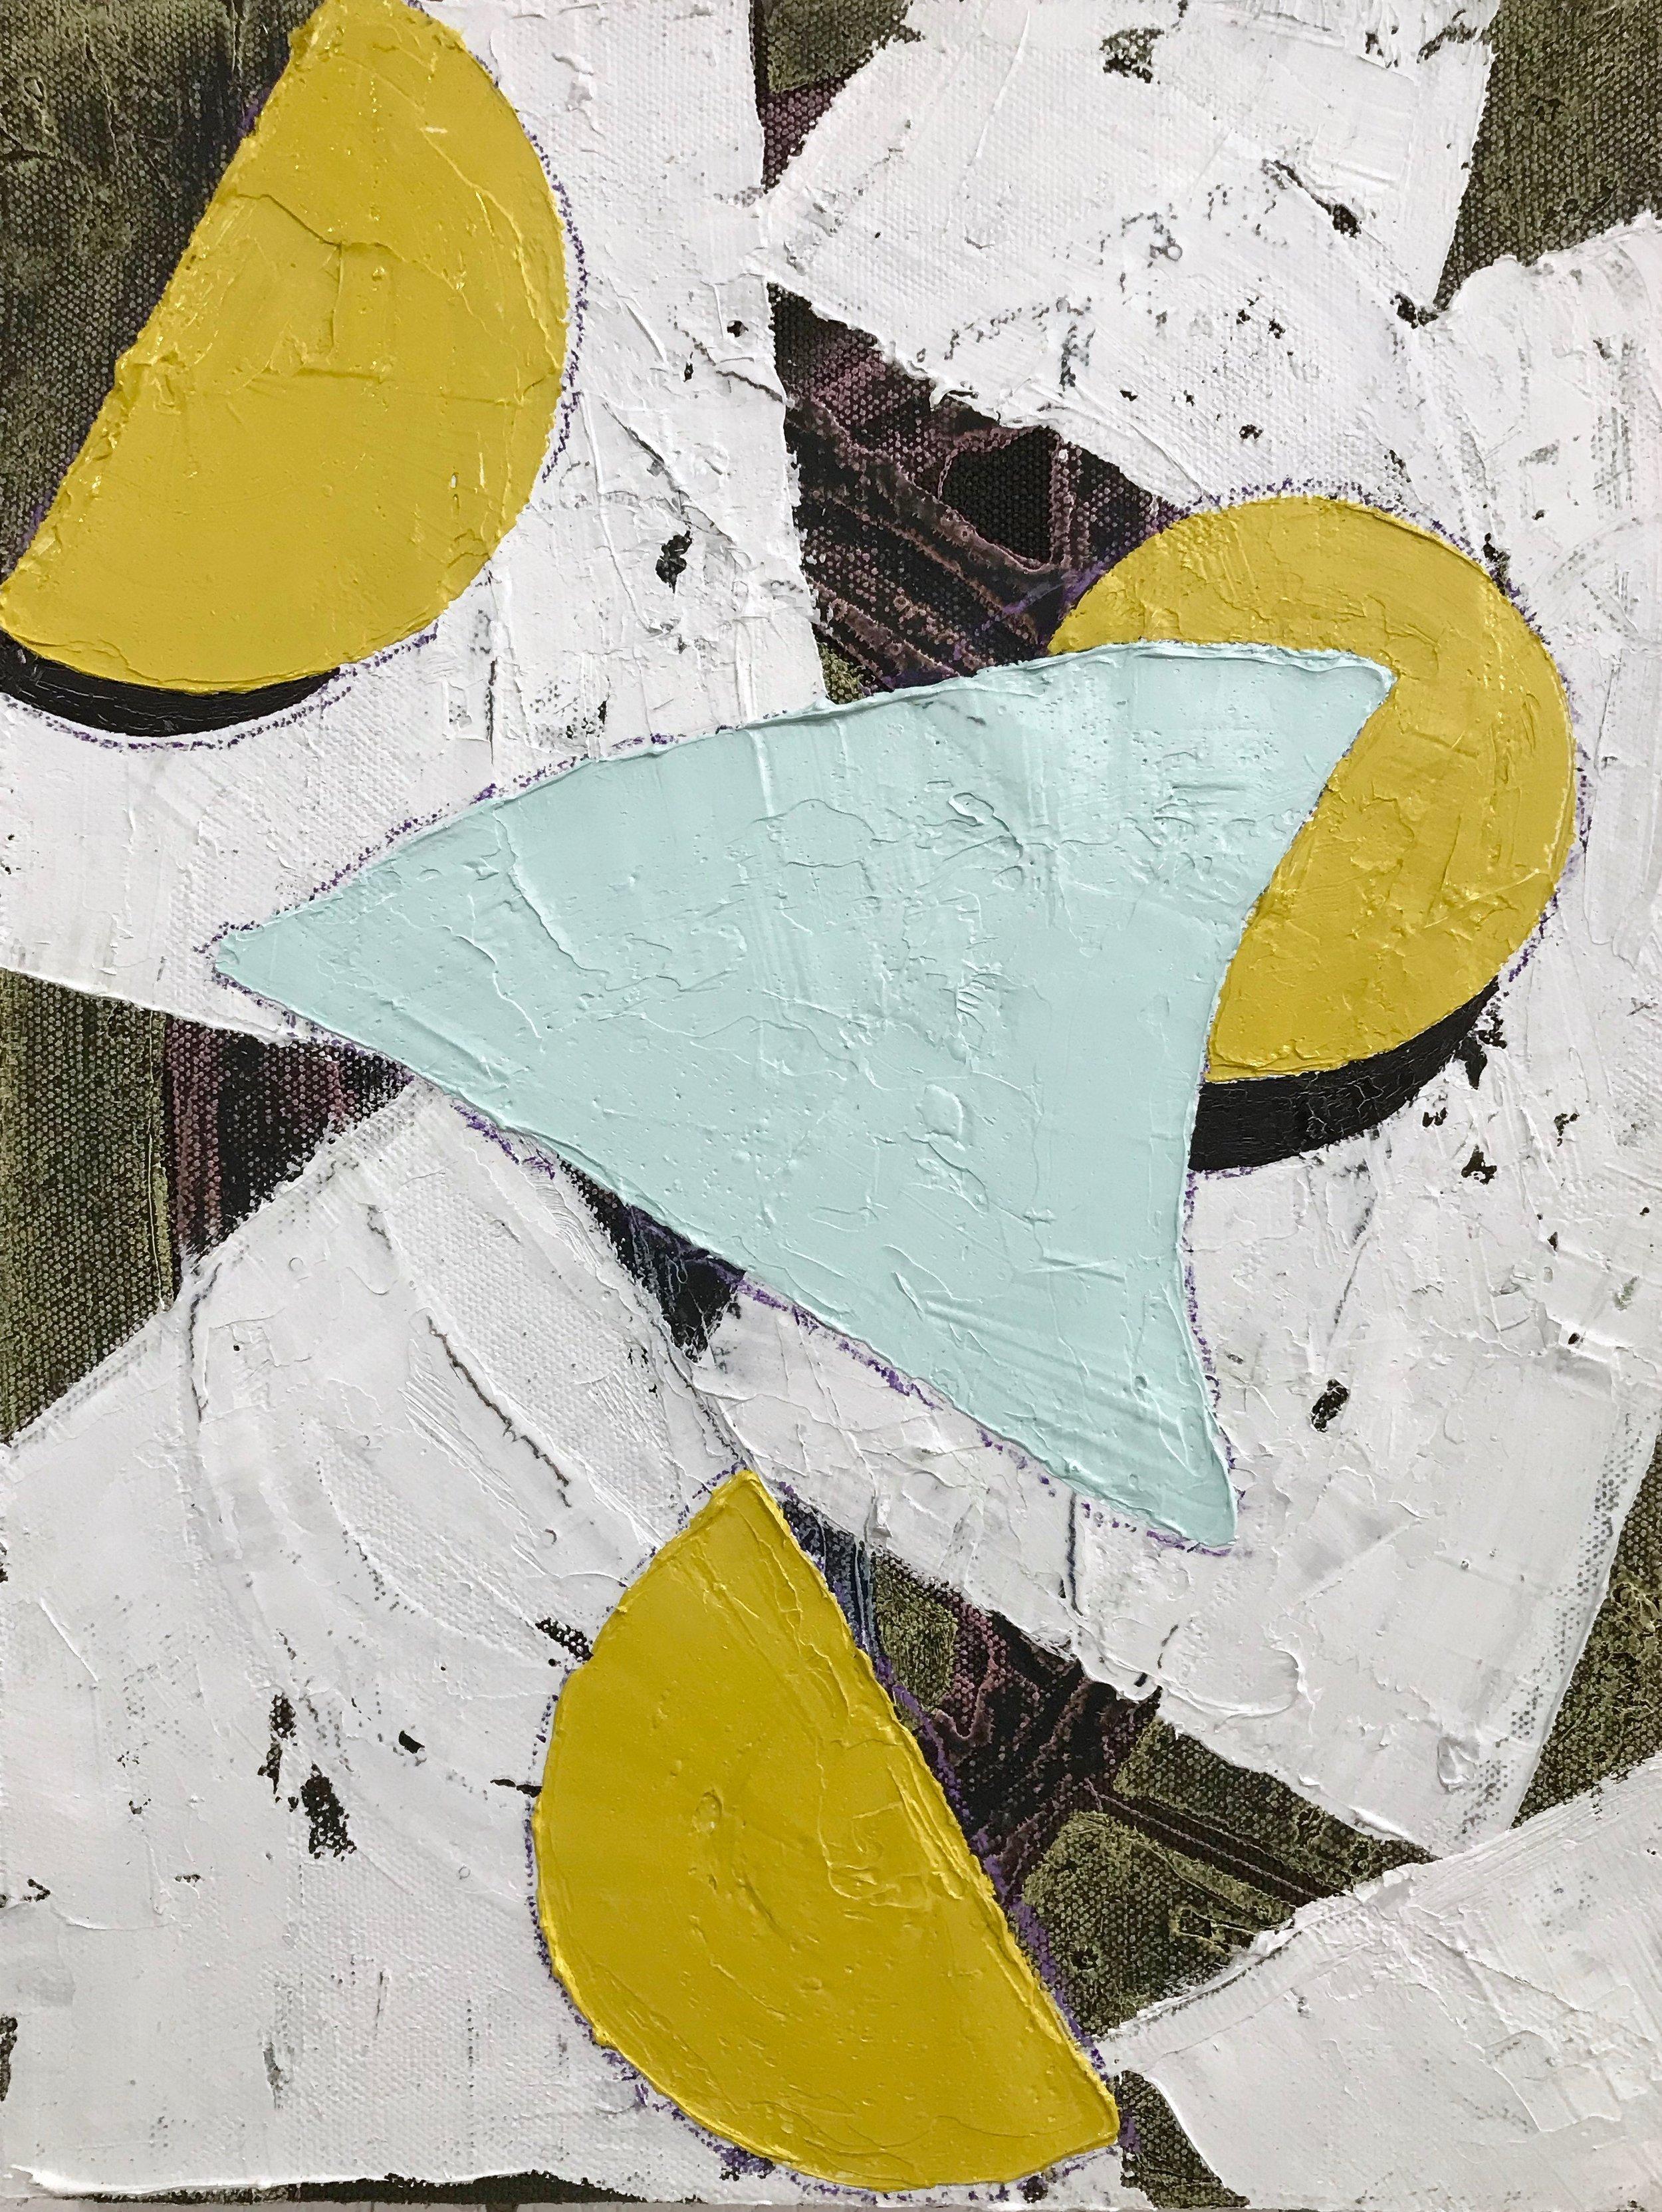 PETER SHARP  Mottle , 2018 oil and acrylic on linen 45 x 36 cm